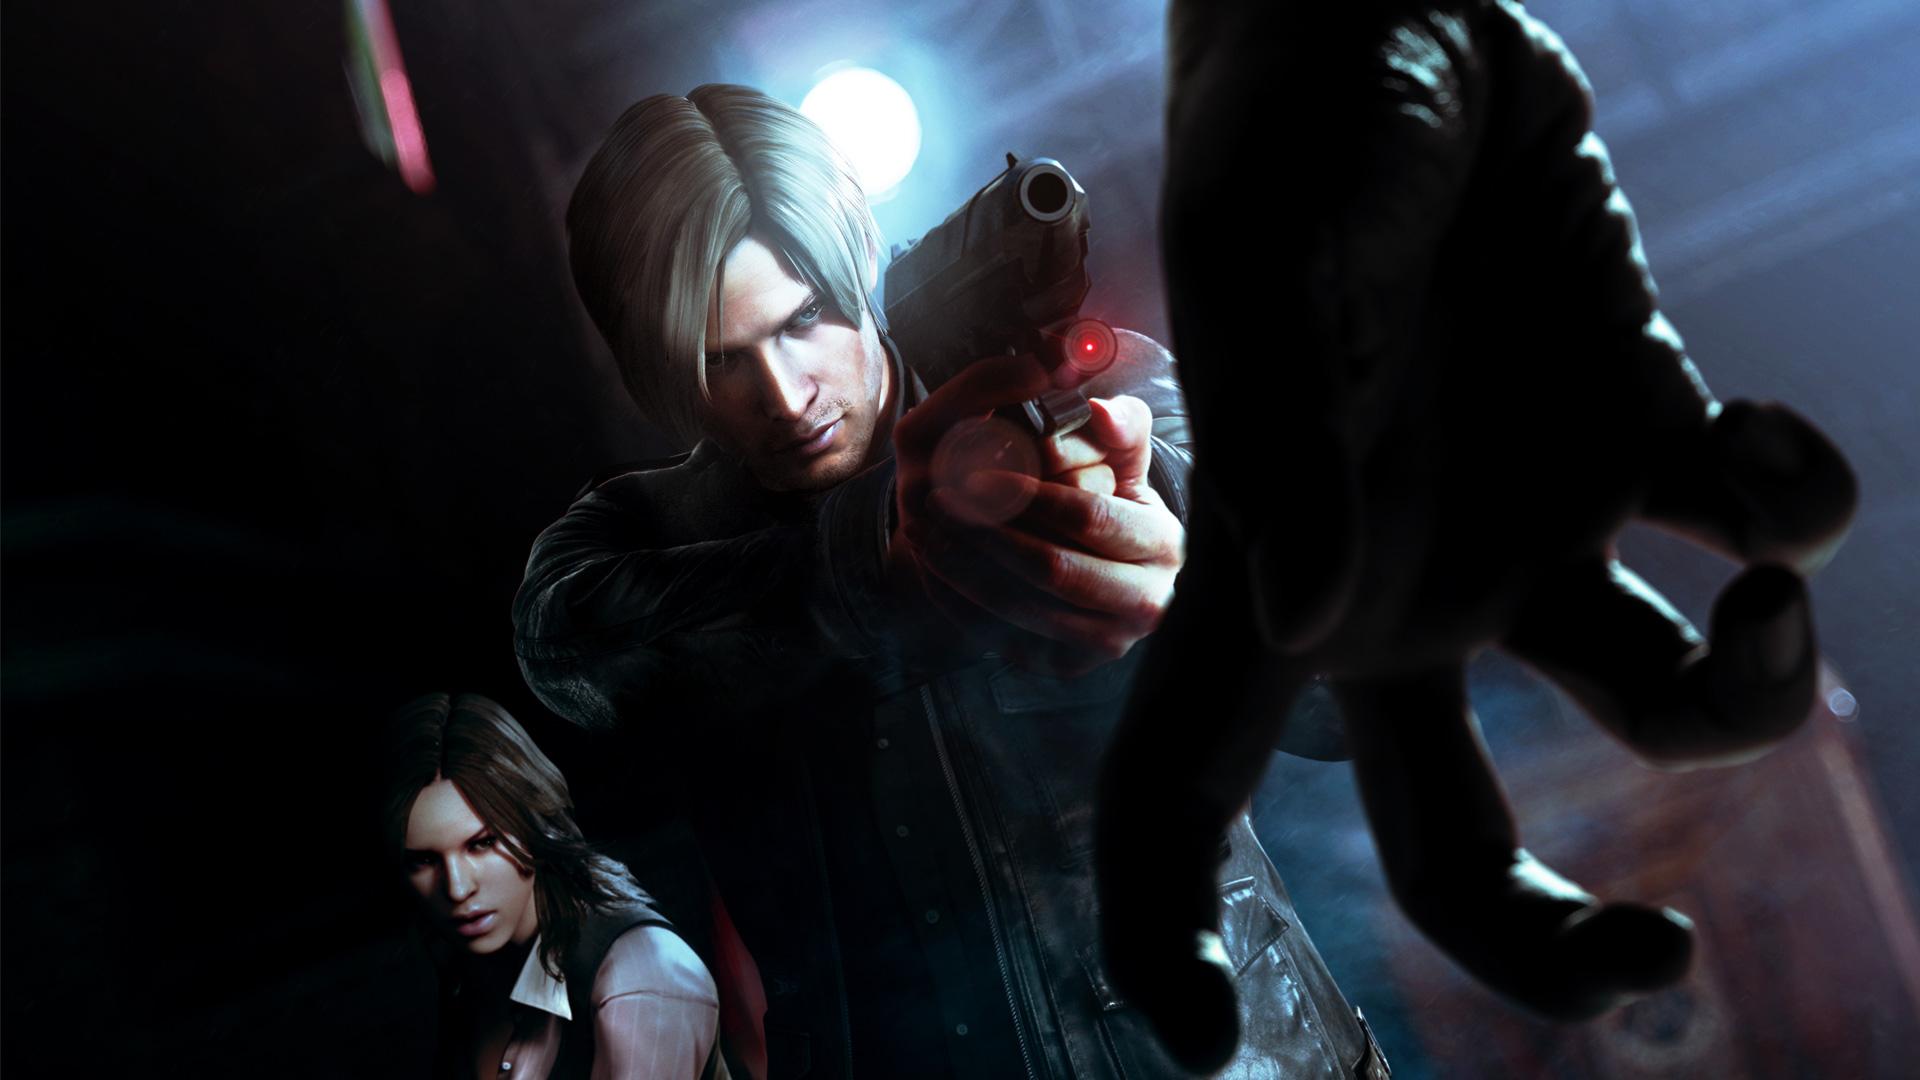 Ya esta disponible el Benchmark de Resident Evil 6 [Anuncios]